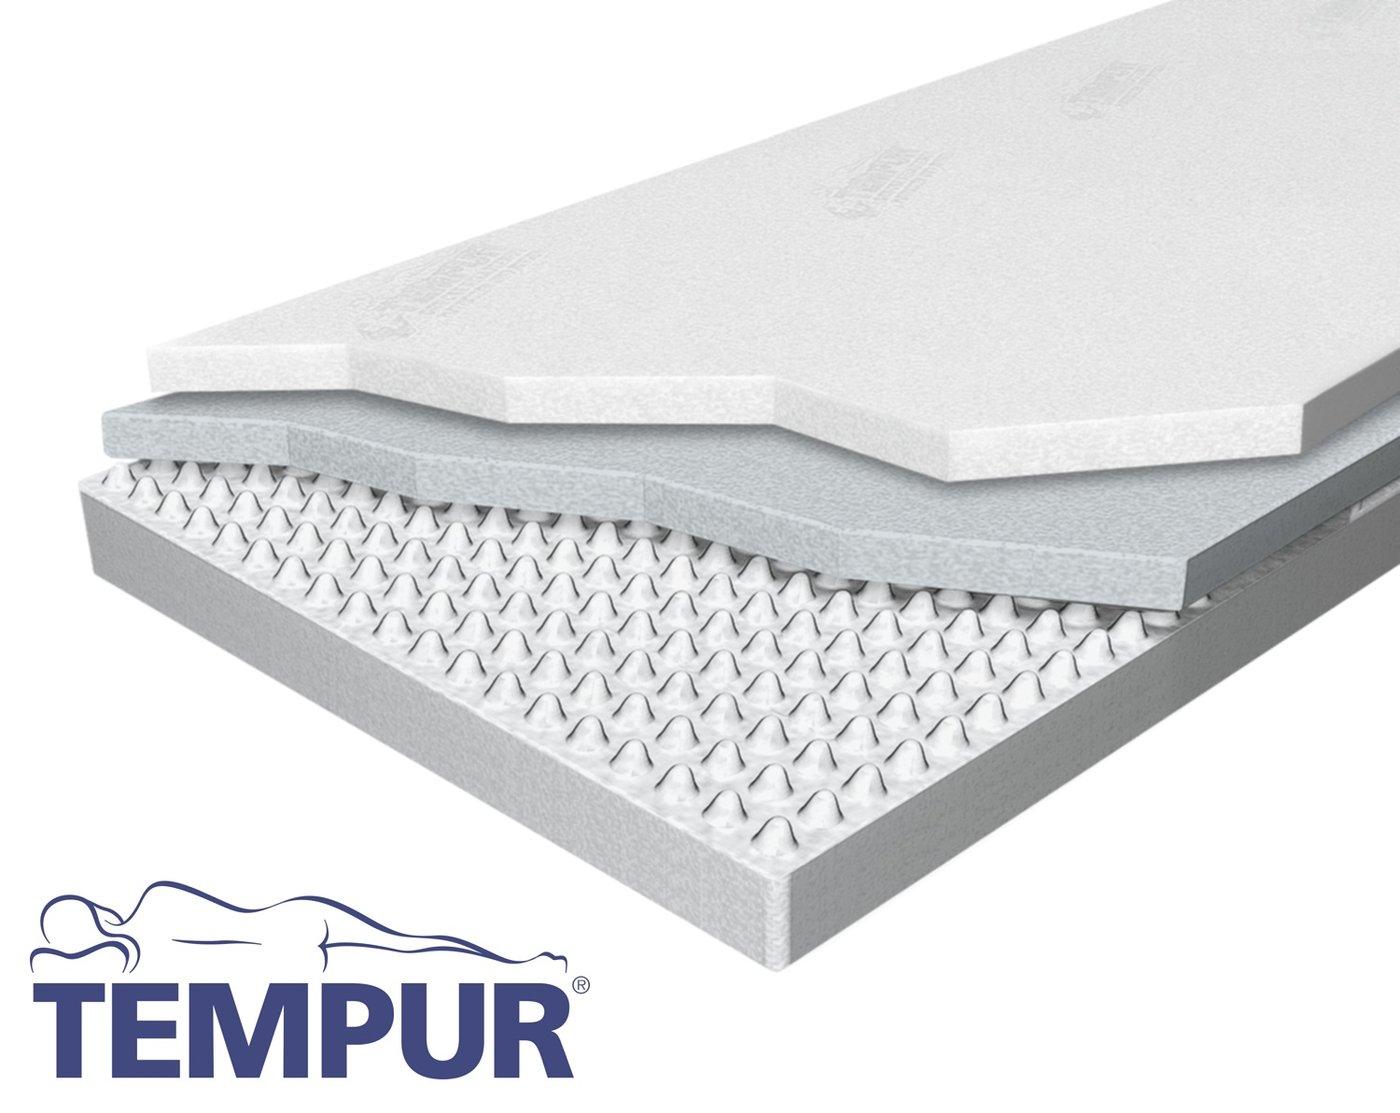 materac tempur cloud 25 tempur materace sklep internetowy. Black Bedroom Furniture Sets. Home Design Ideas